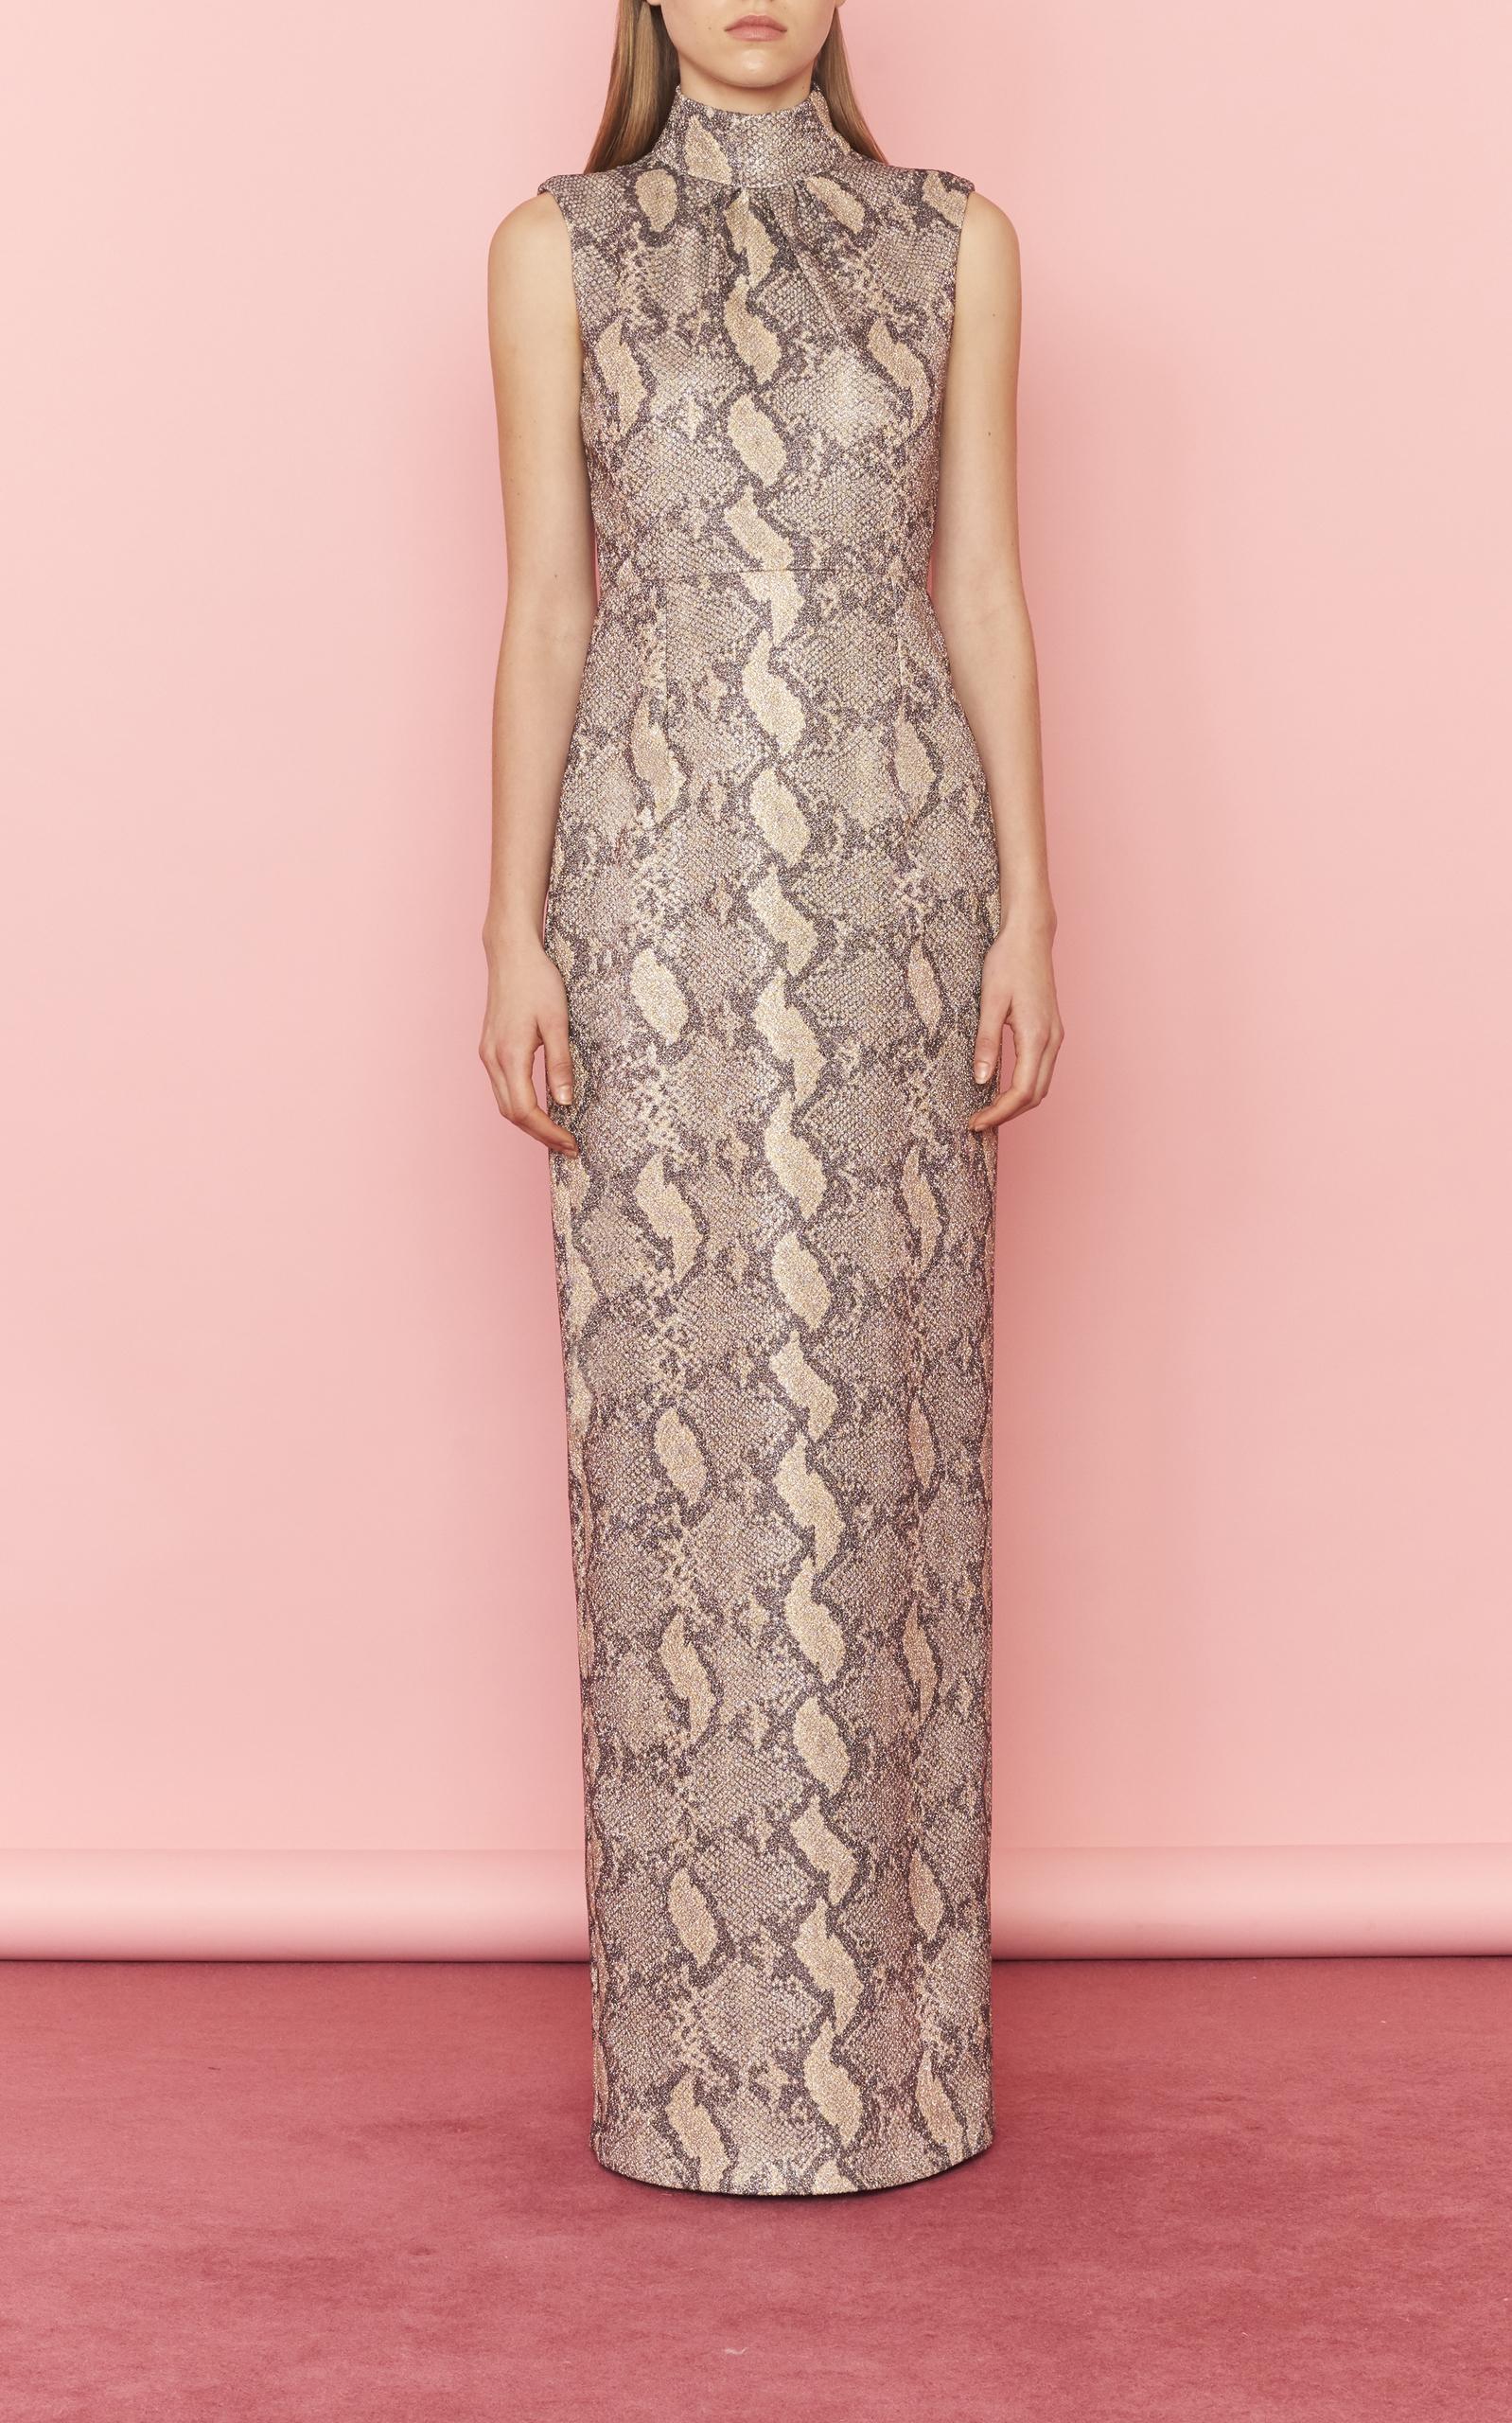 Georgina Snake-Effect Crepe Gown Emilia Wickstead 6FQ6rm7